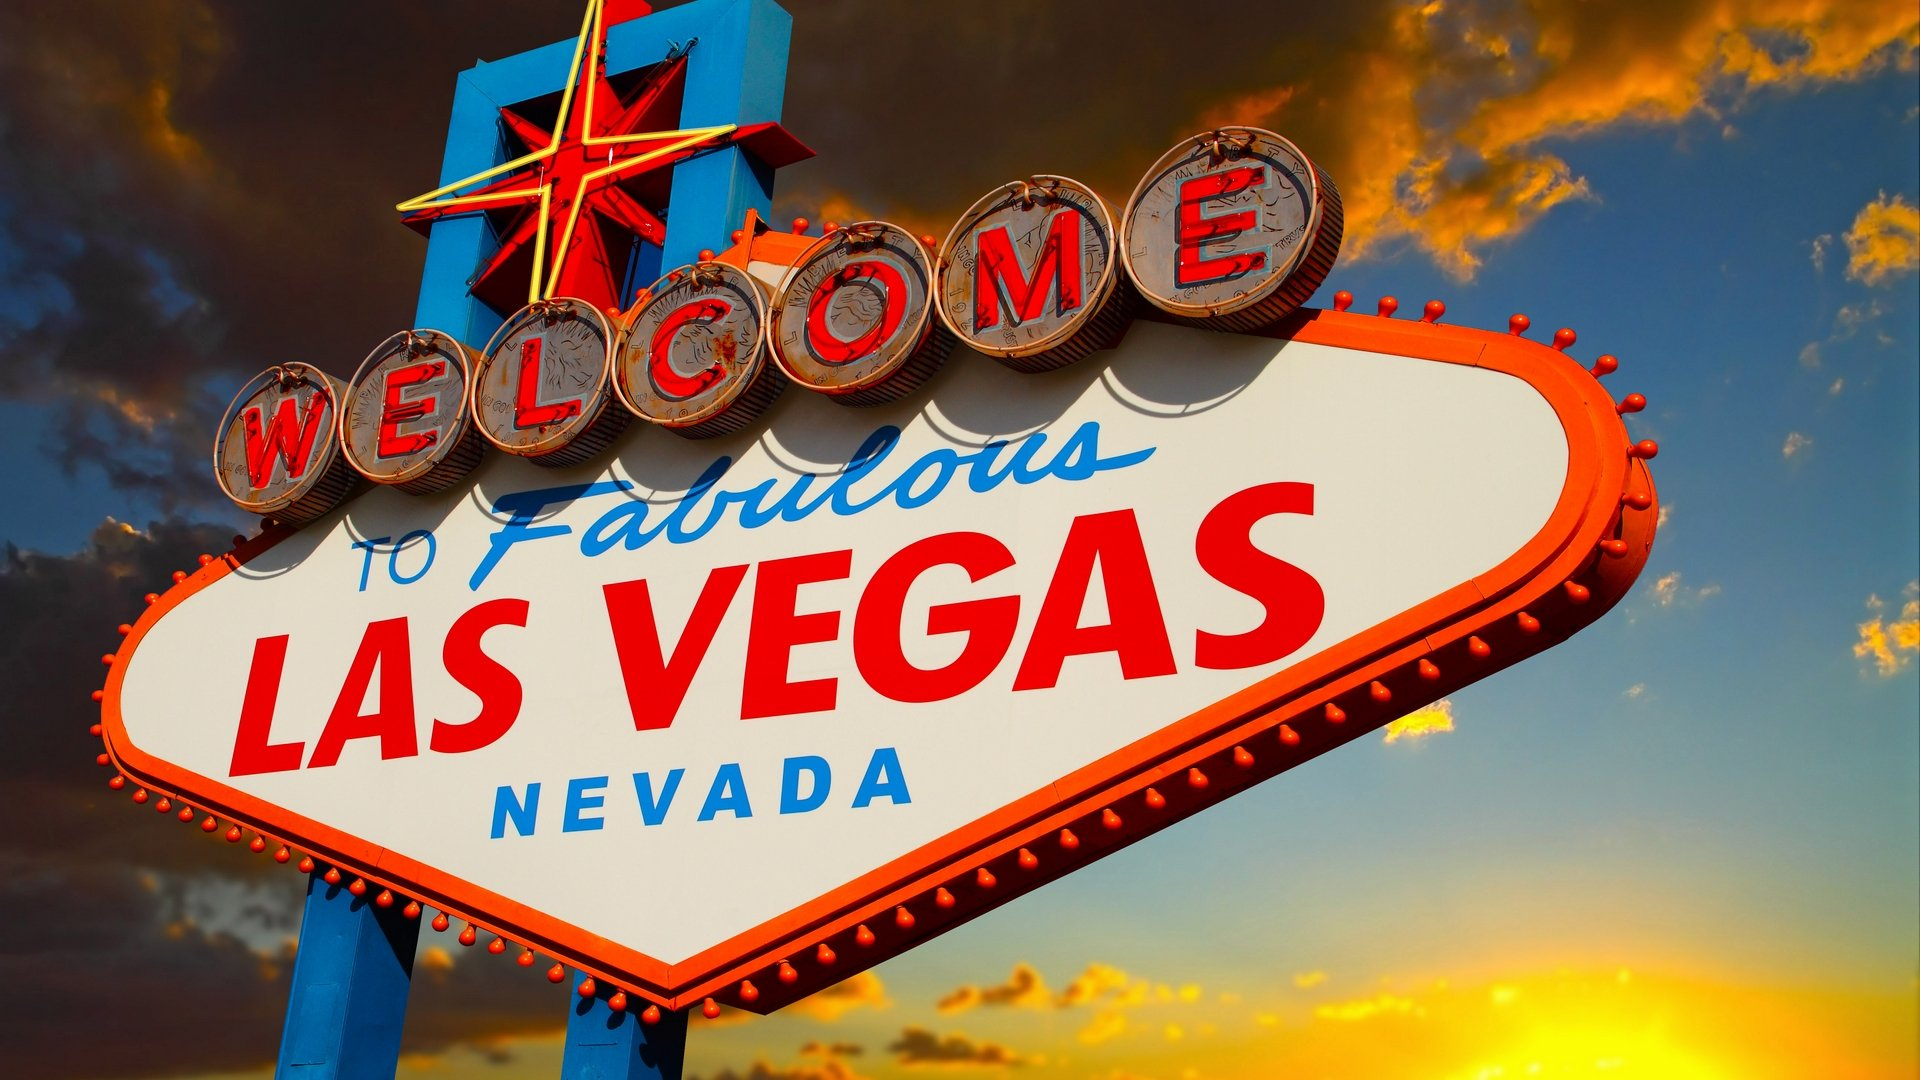 Fabulous Las Vegas Vegas Nevada wallpaper